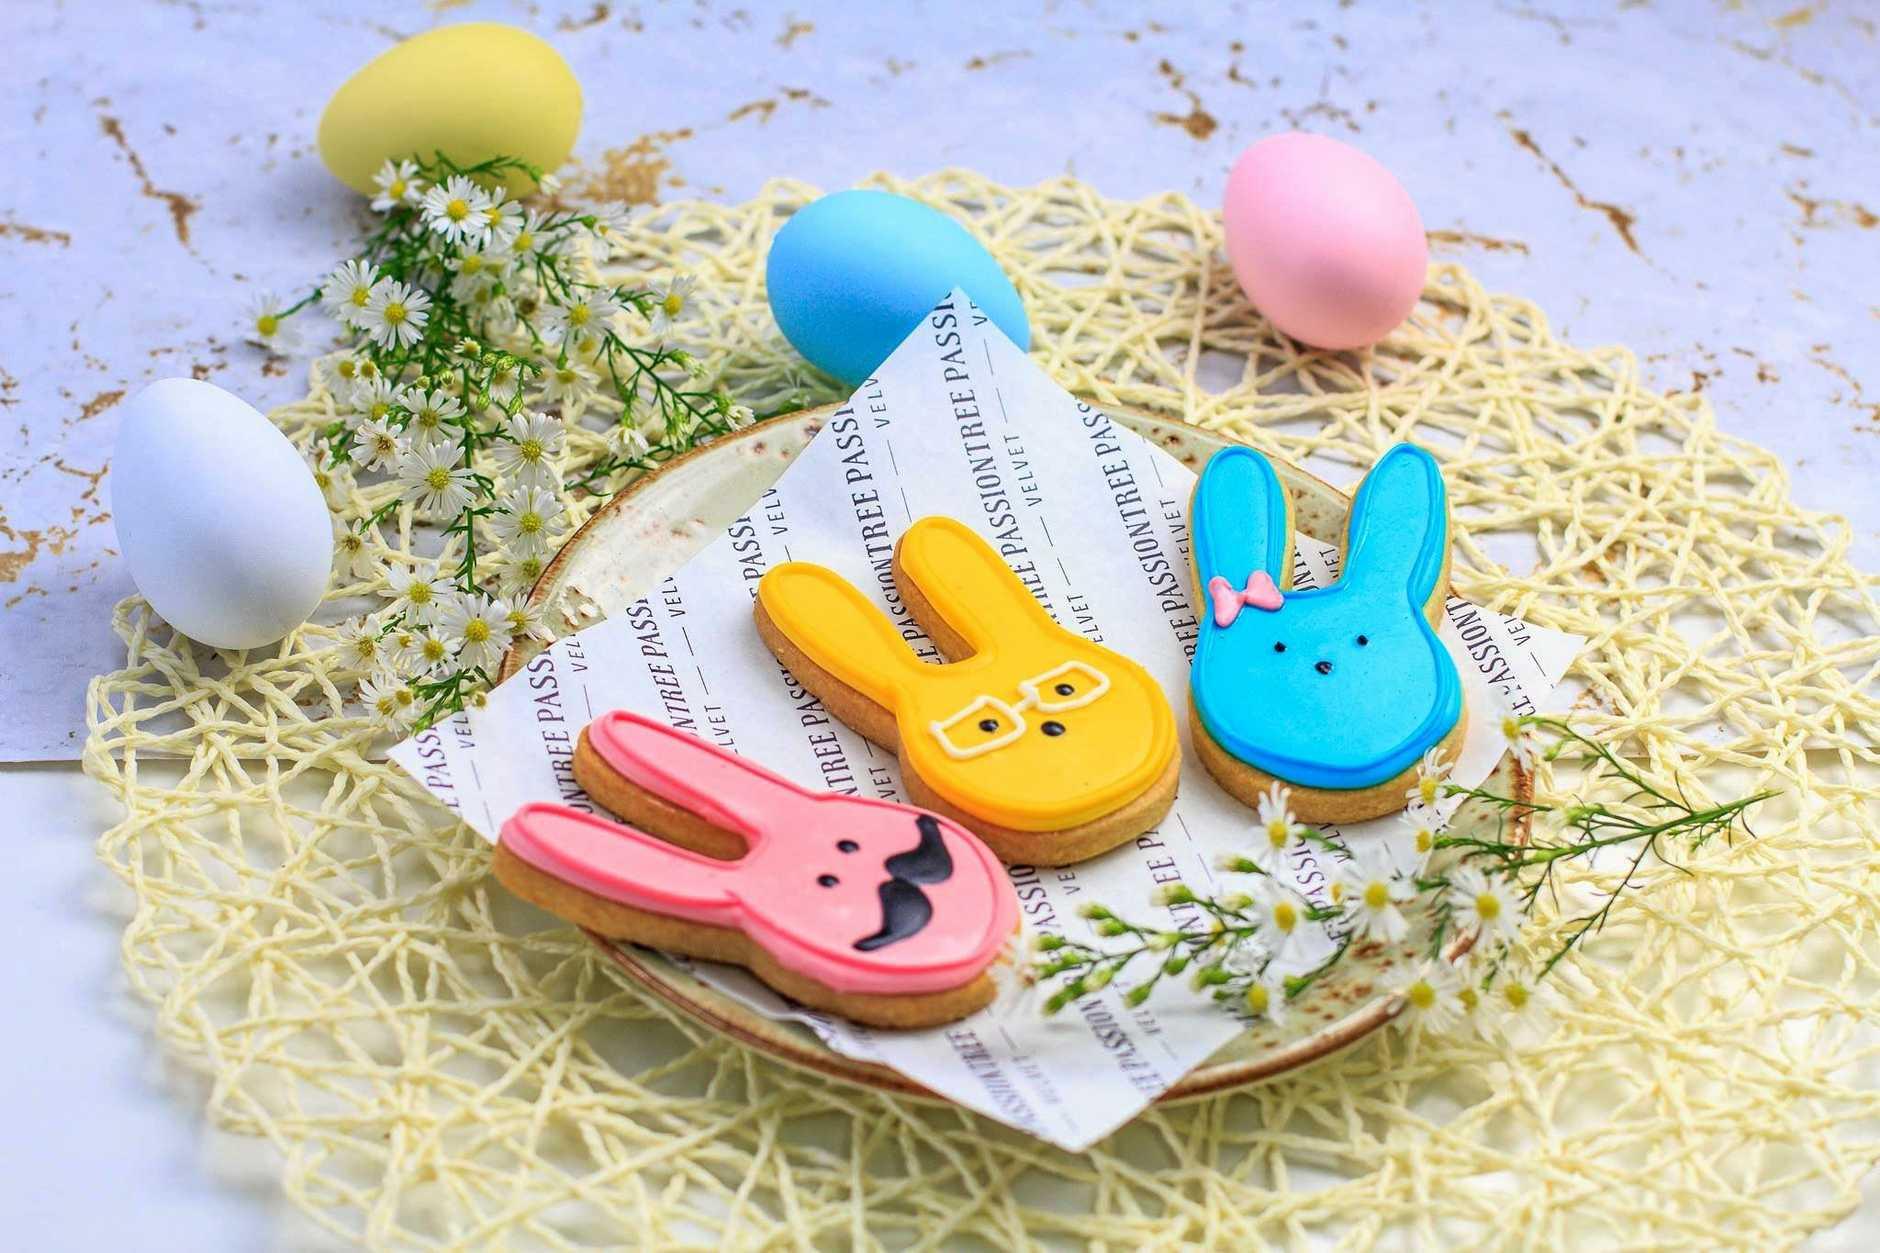 Easter treats around Toowoomba: Bunny cookies from Passiontree Velvet.